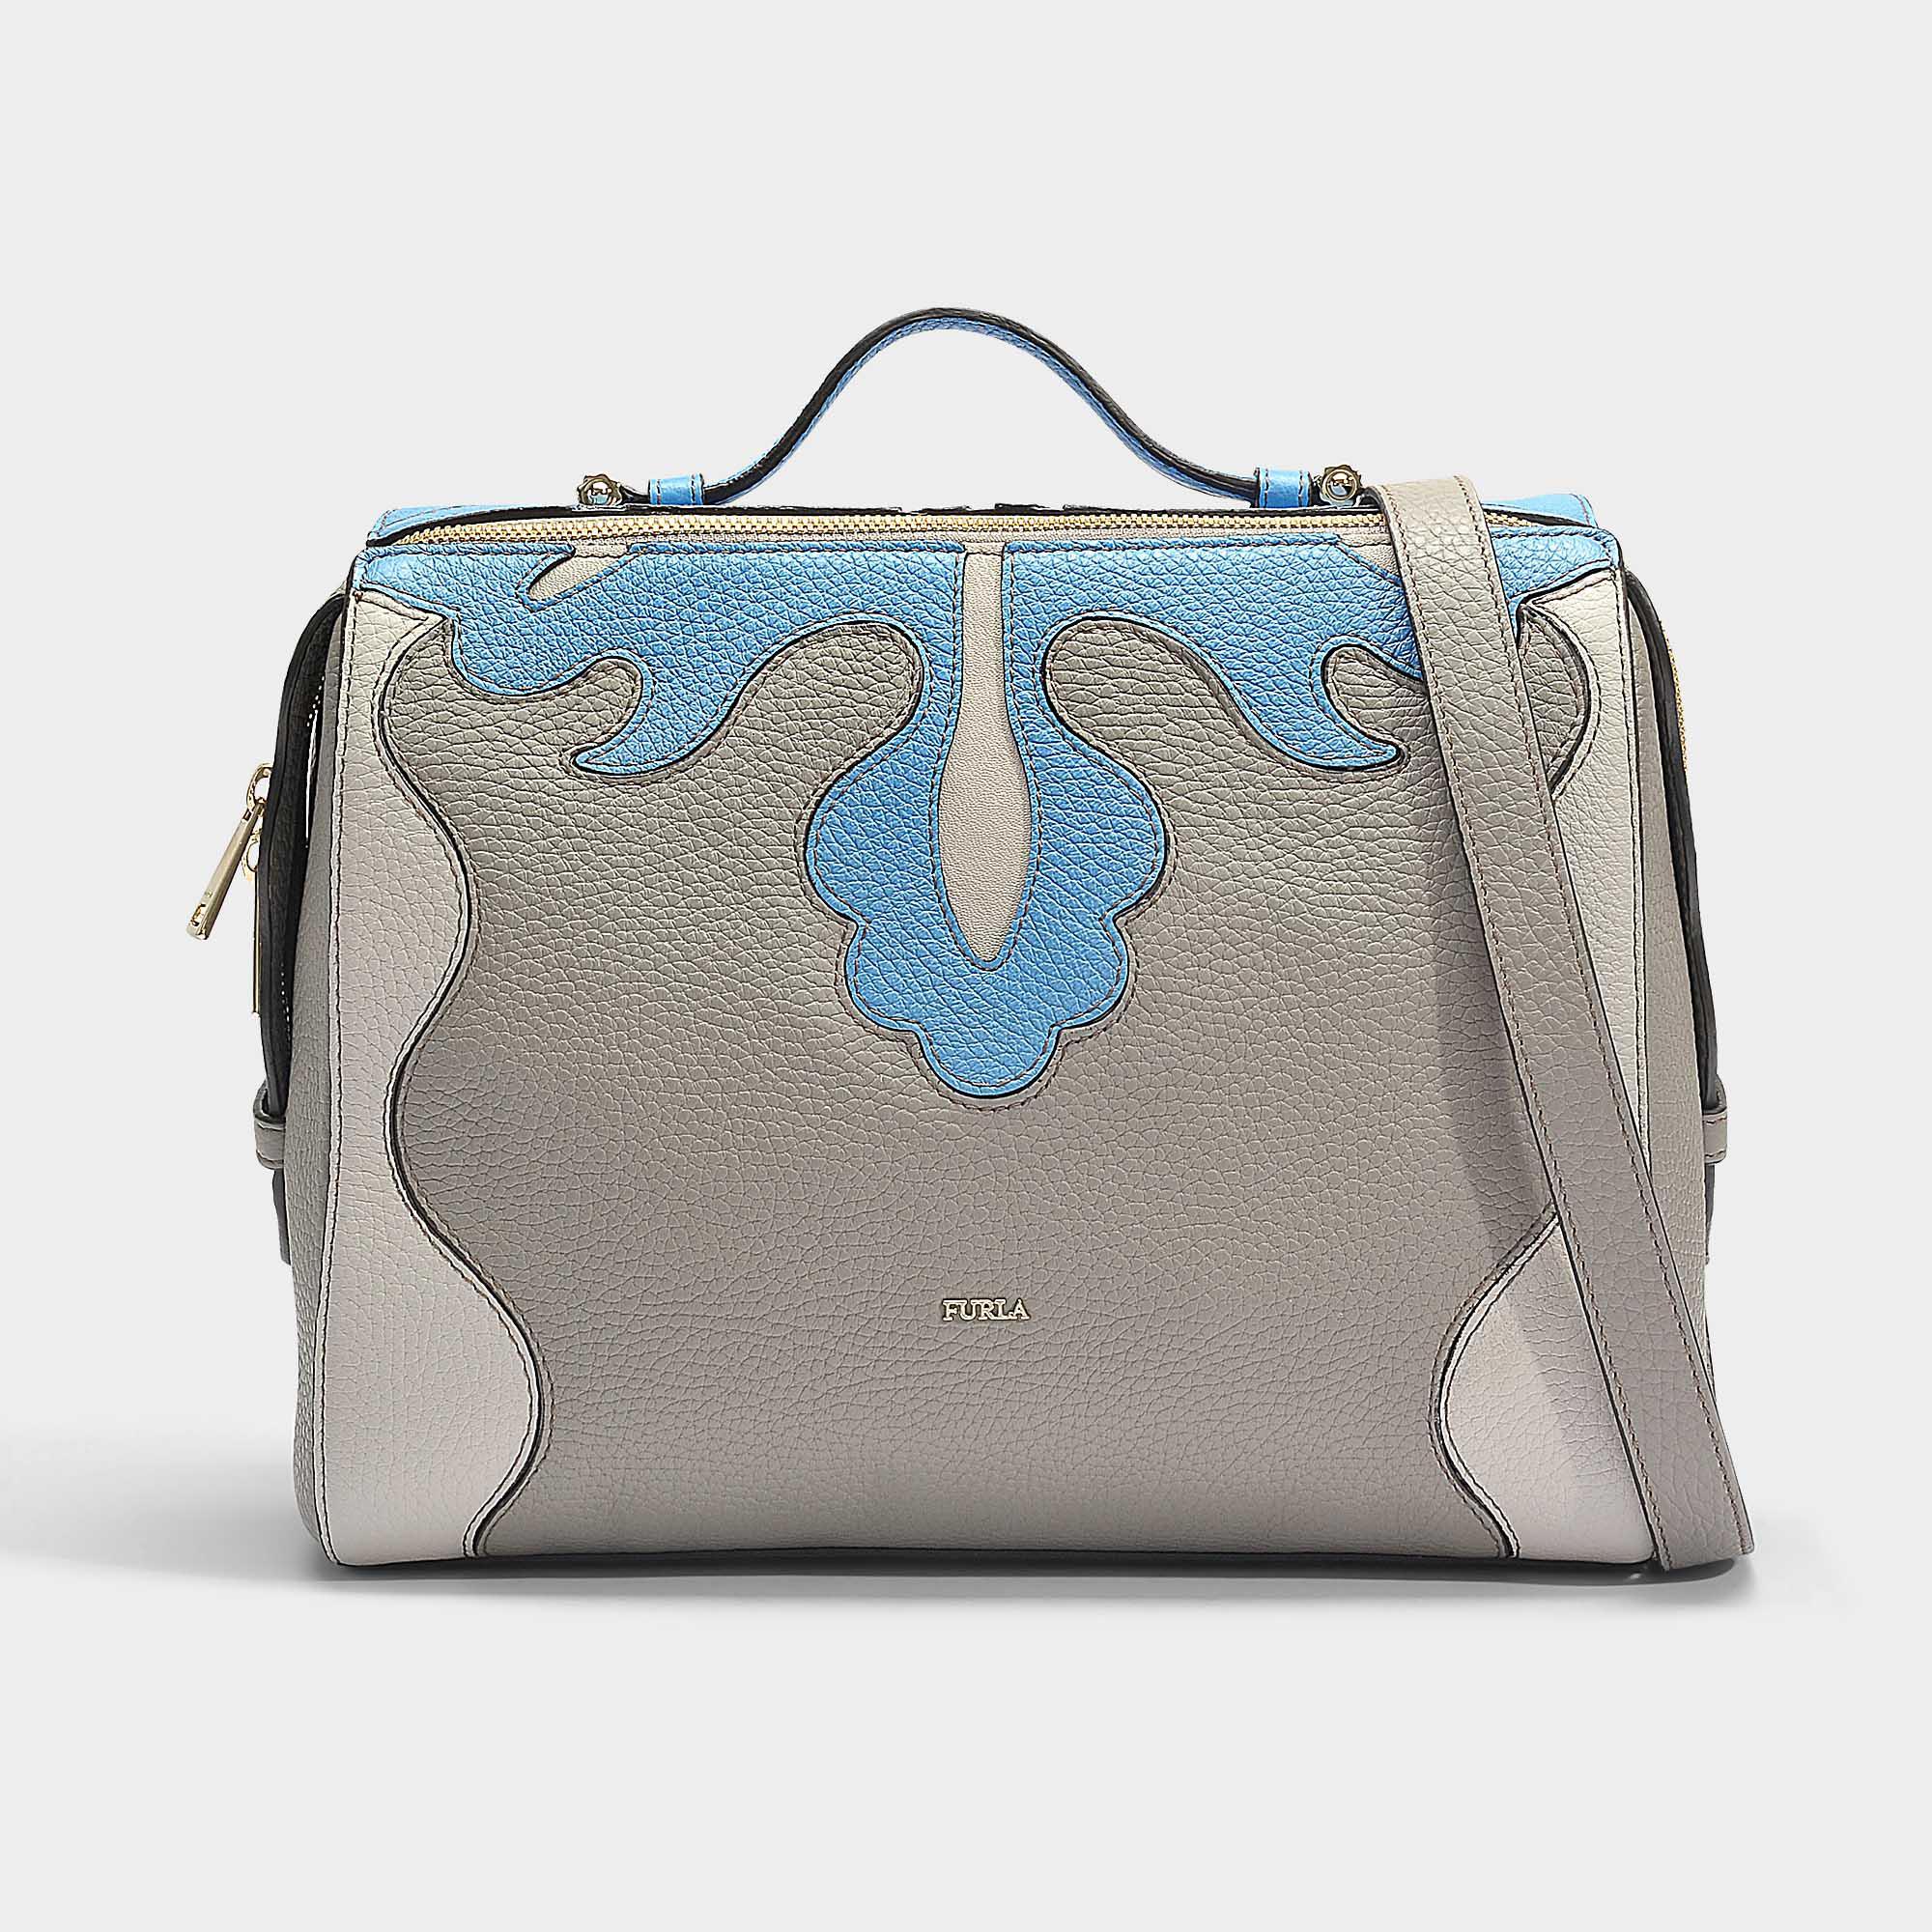 f6158fd94 Furla Dalia Medium Top Handle Bag In Sand Calfskin - Lyst